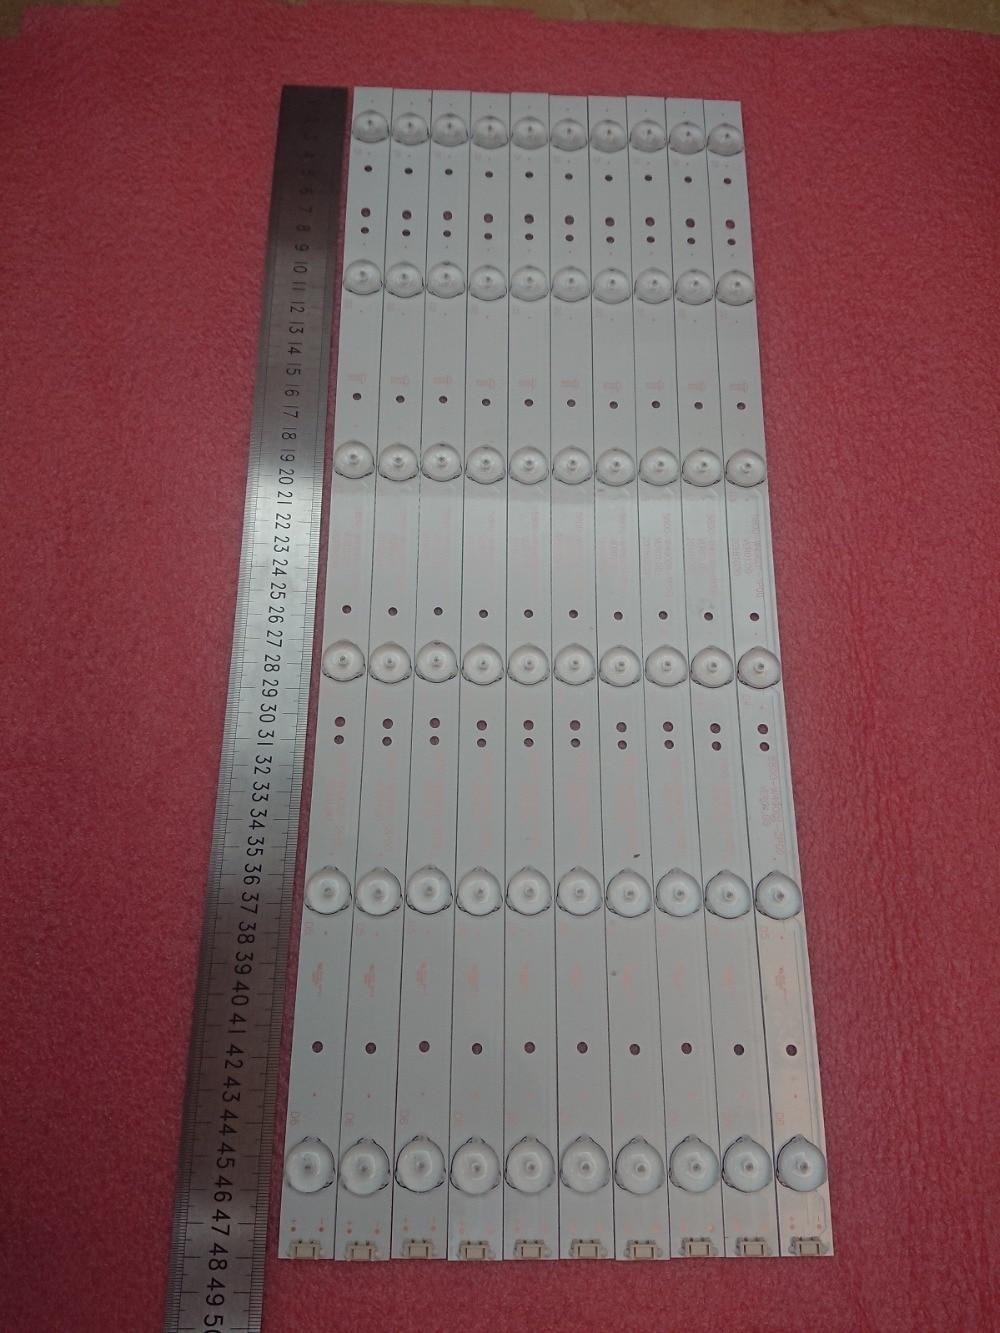 Novo conjunto = 50 5 pcs 6LED 480 milímetros tira conduzida luz de fundo para LC490DUJ-SHA2 5800-W49001-1P00 5800-W49001-2P00 0P00 DP00 5850-W50007-1P00